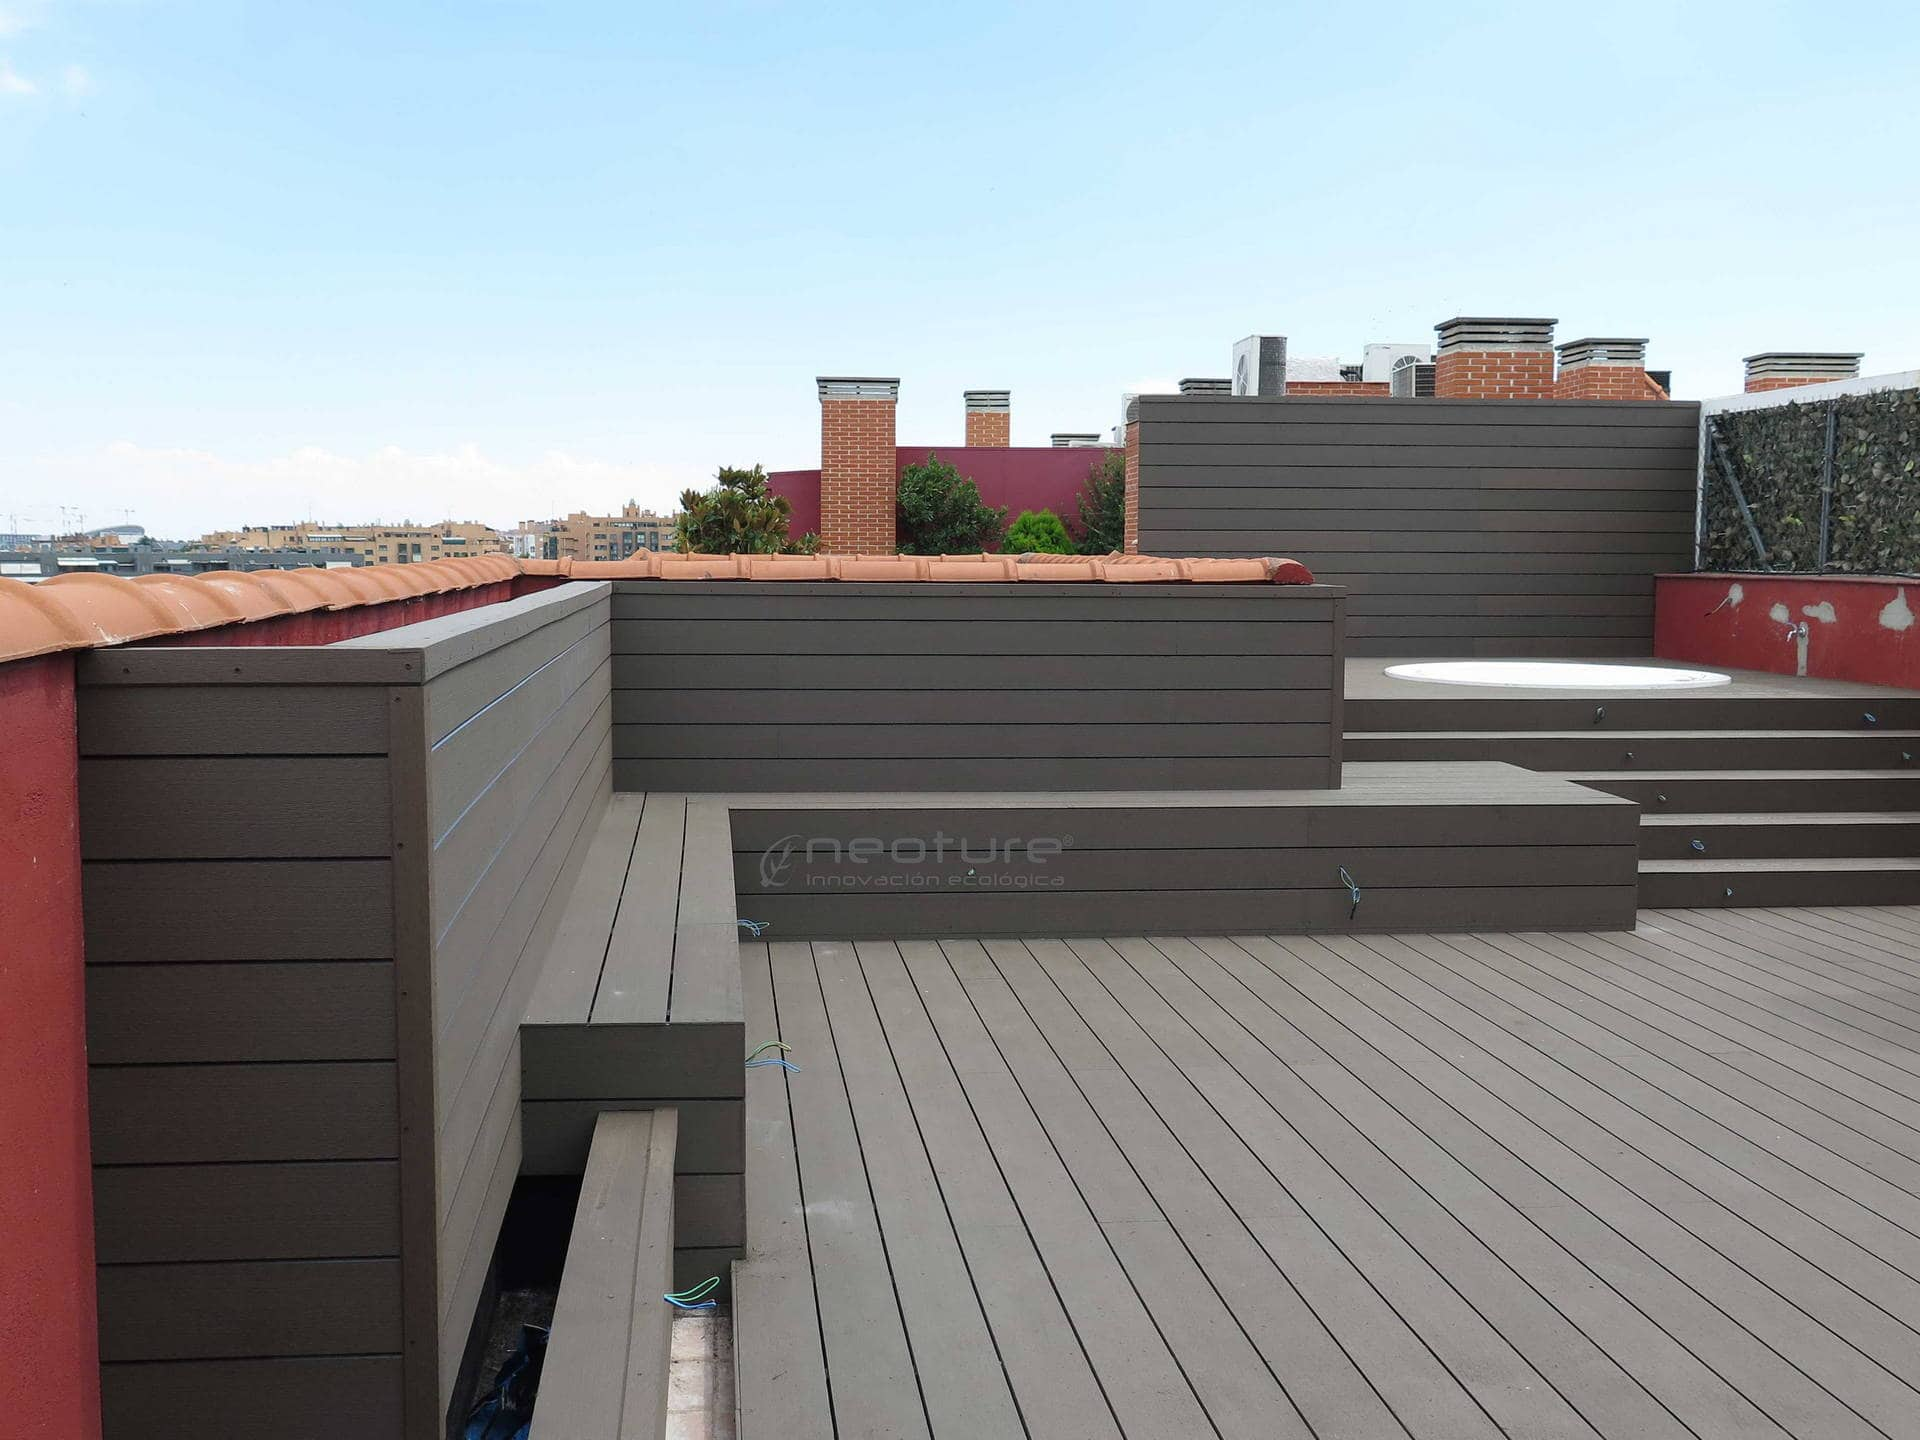 Tarimas y baldosas para exterior en madera sint tica - Tarima para terraza ...